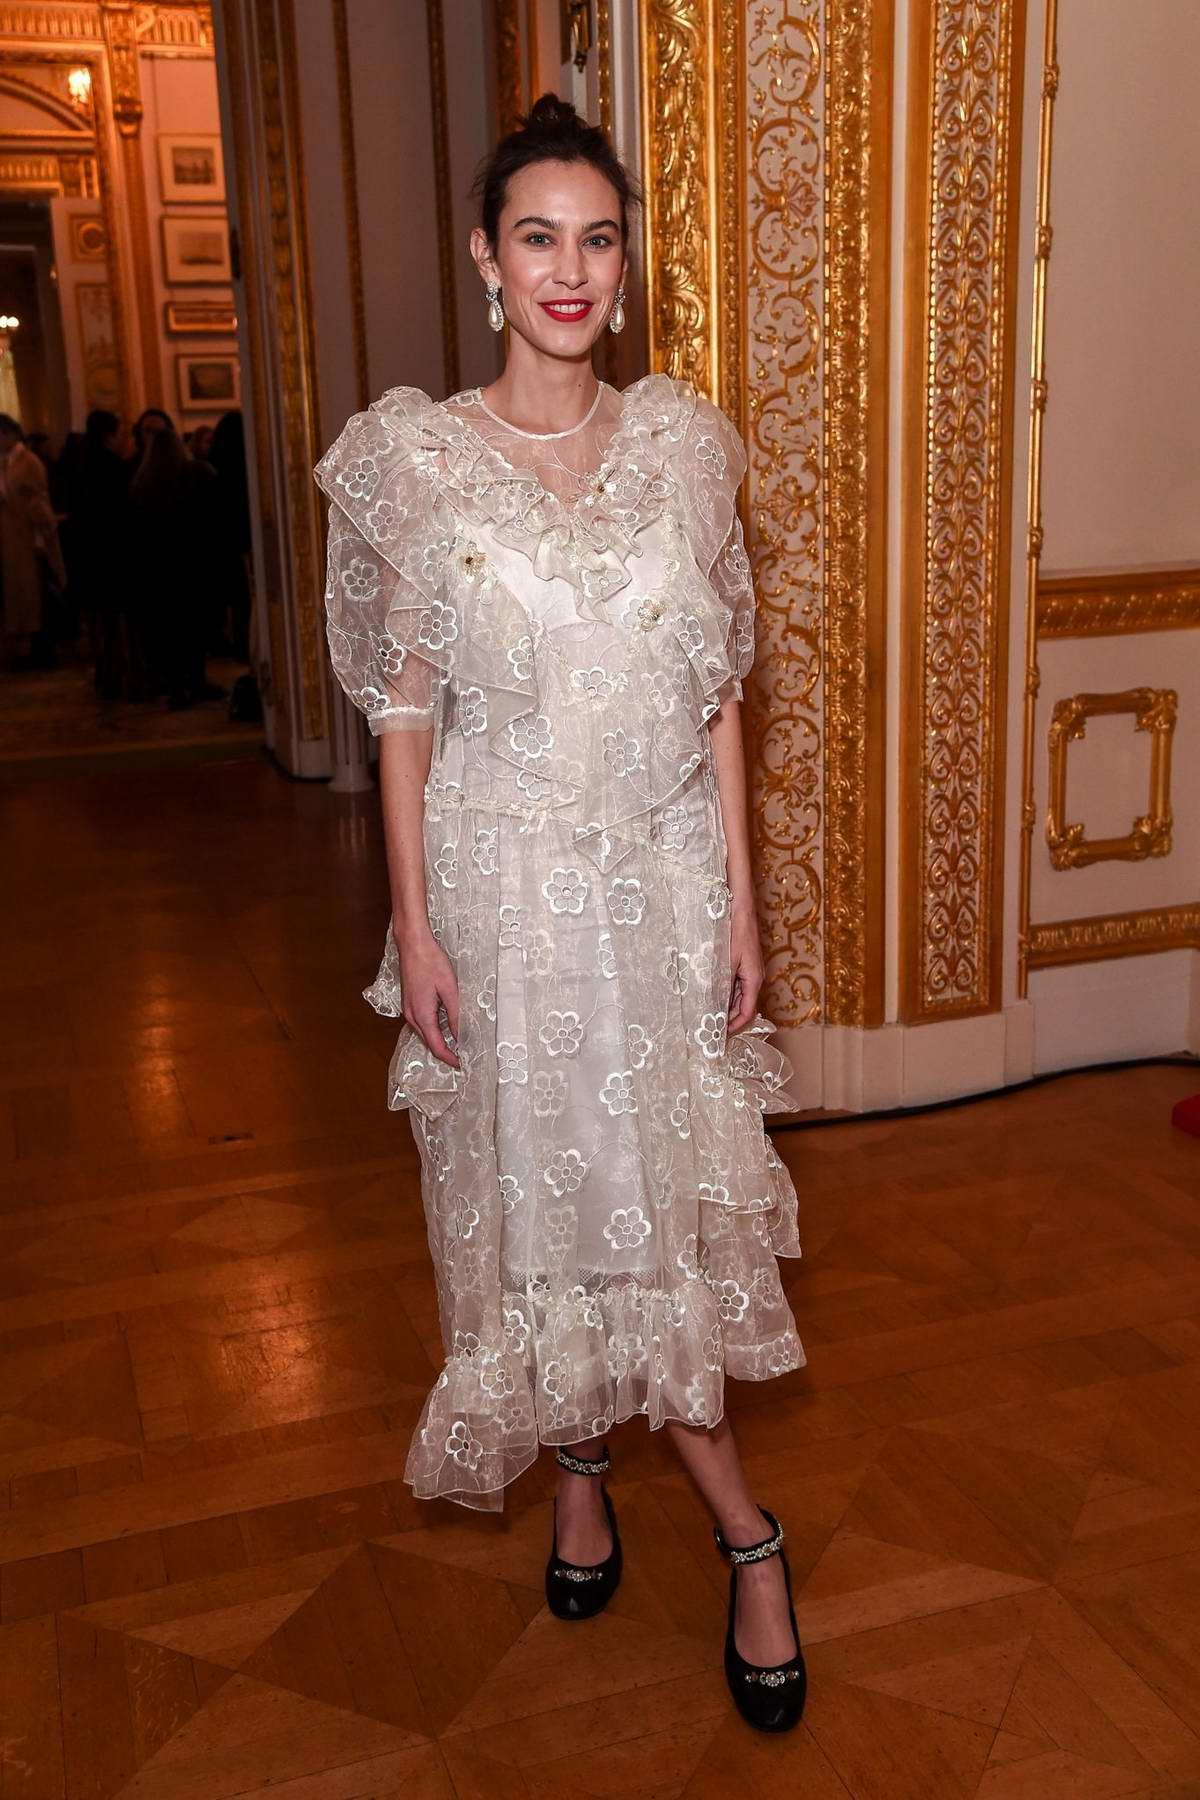 Alexa Chung attends the Simone Rocha fashion show during London Fashion Week at Lancaster Houseon in London, UK